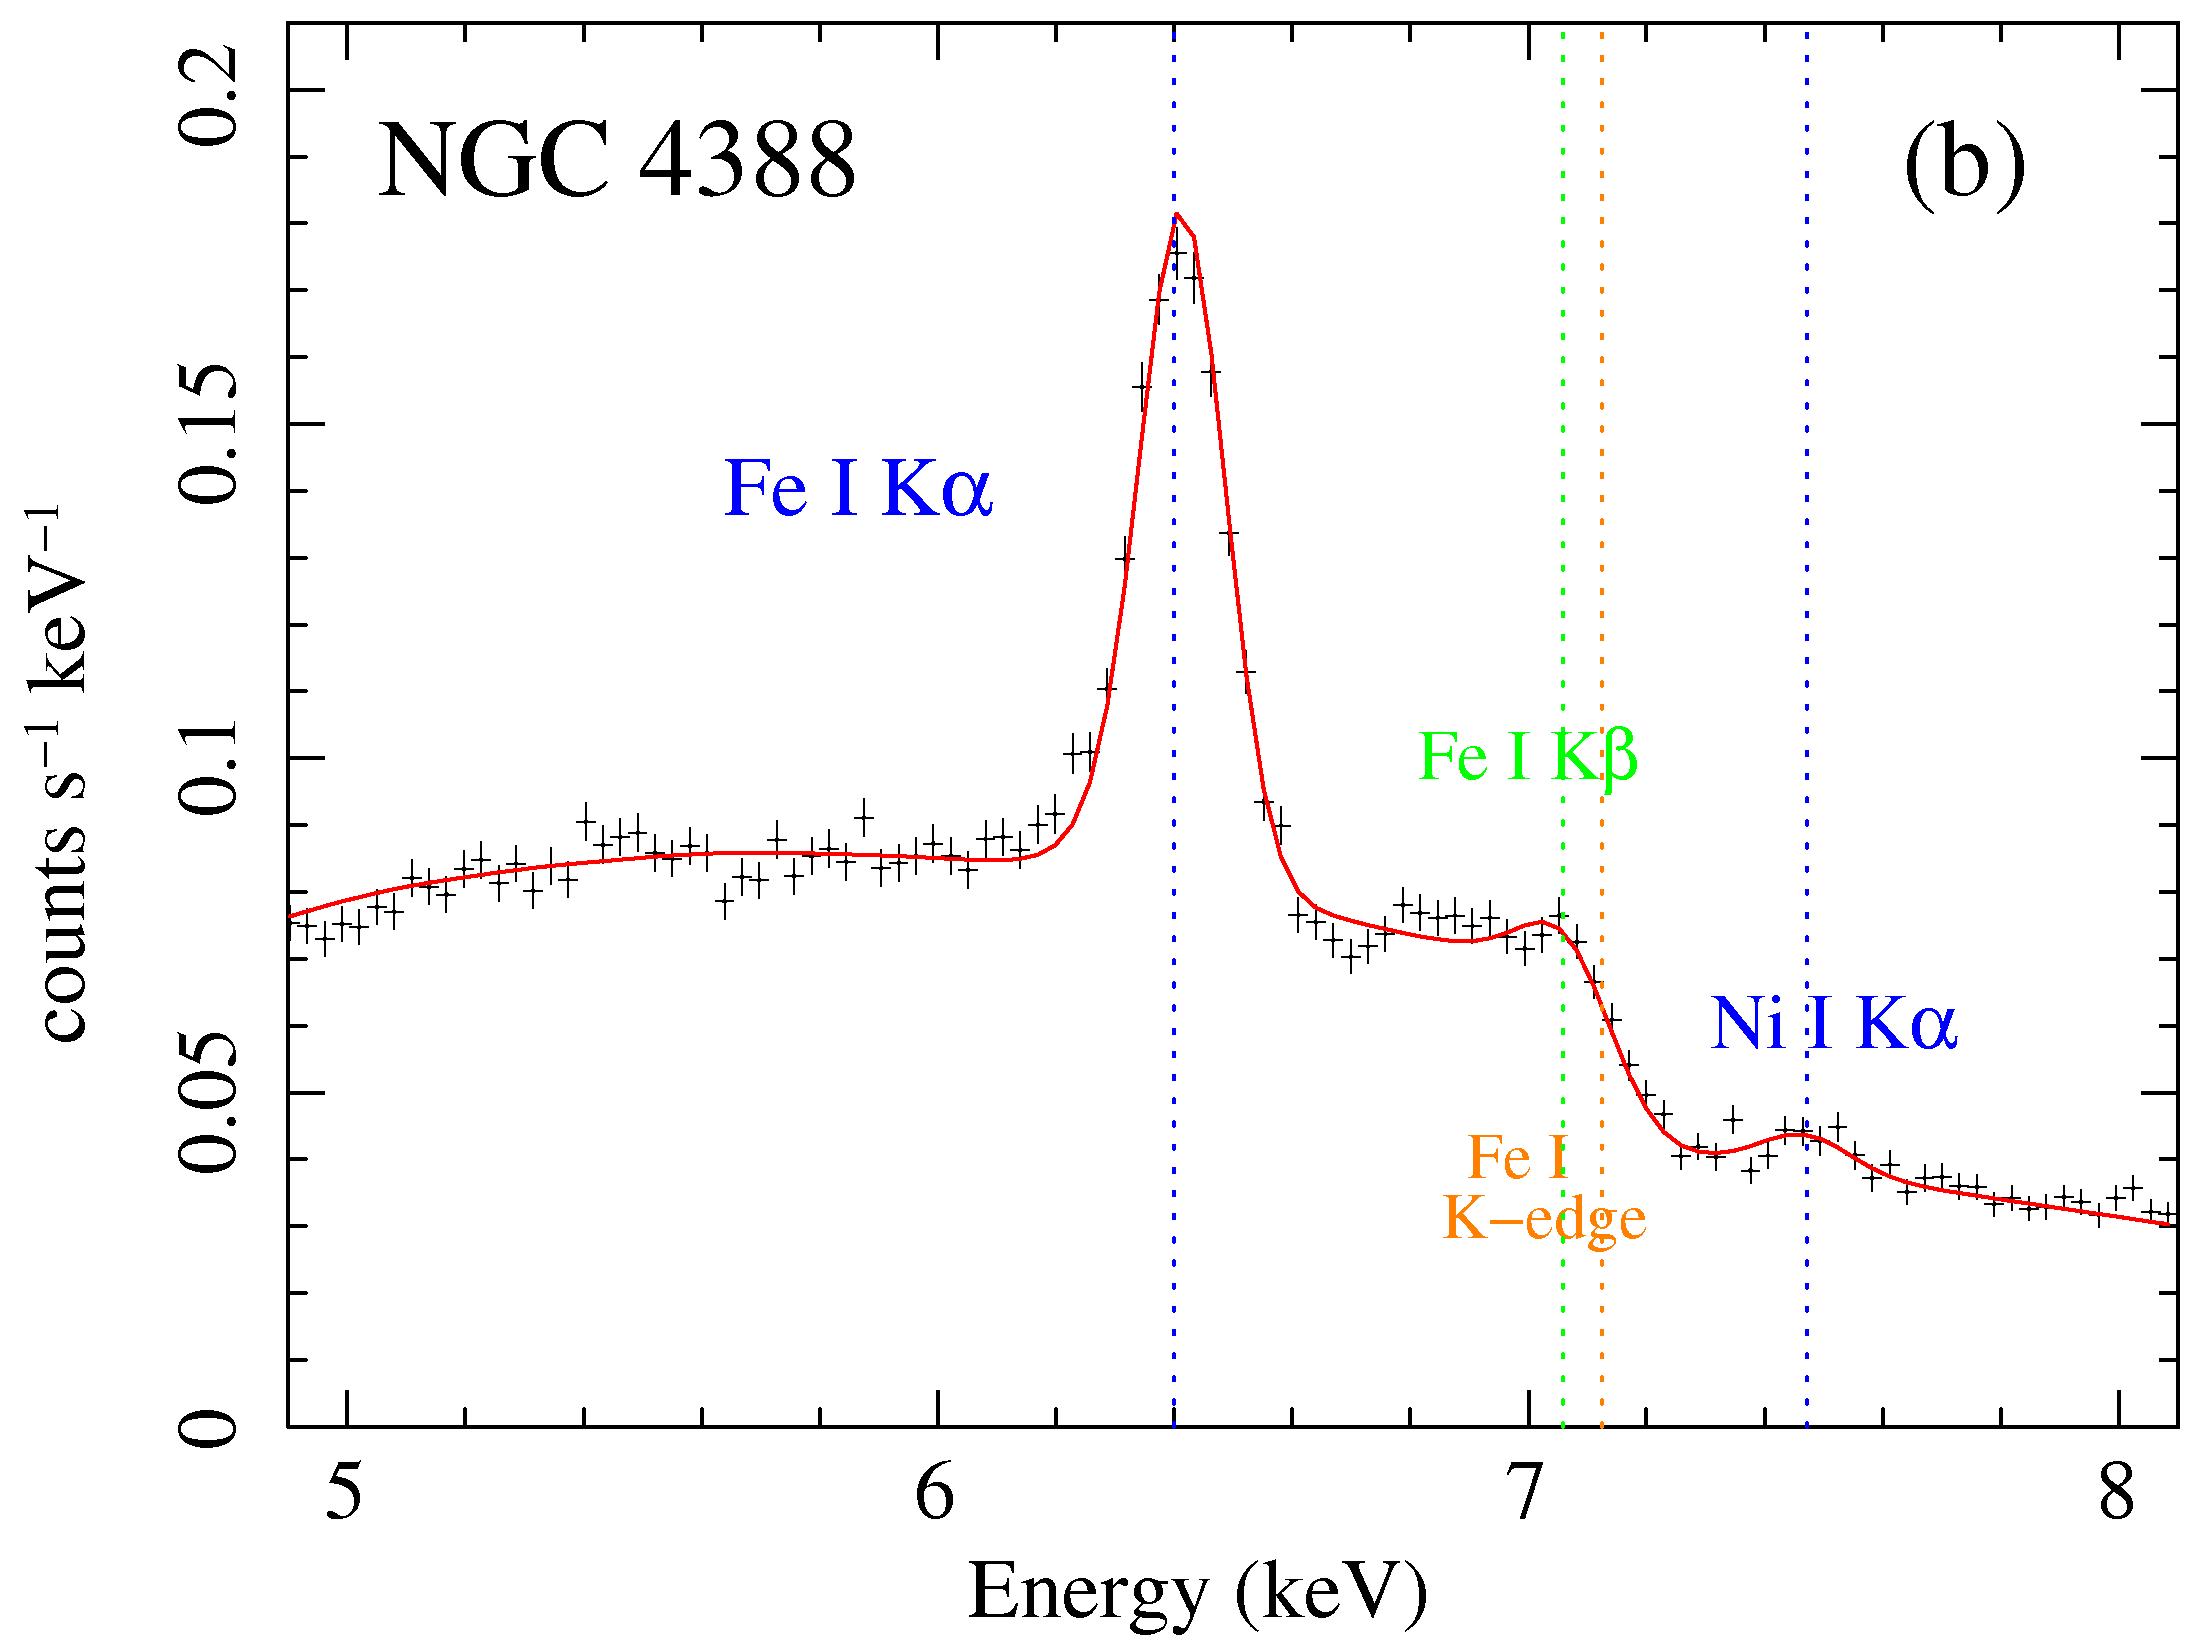 MYTorus fit to NGC 4388 Suzaku data: Fe K alpha line region